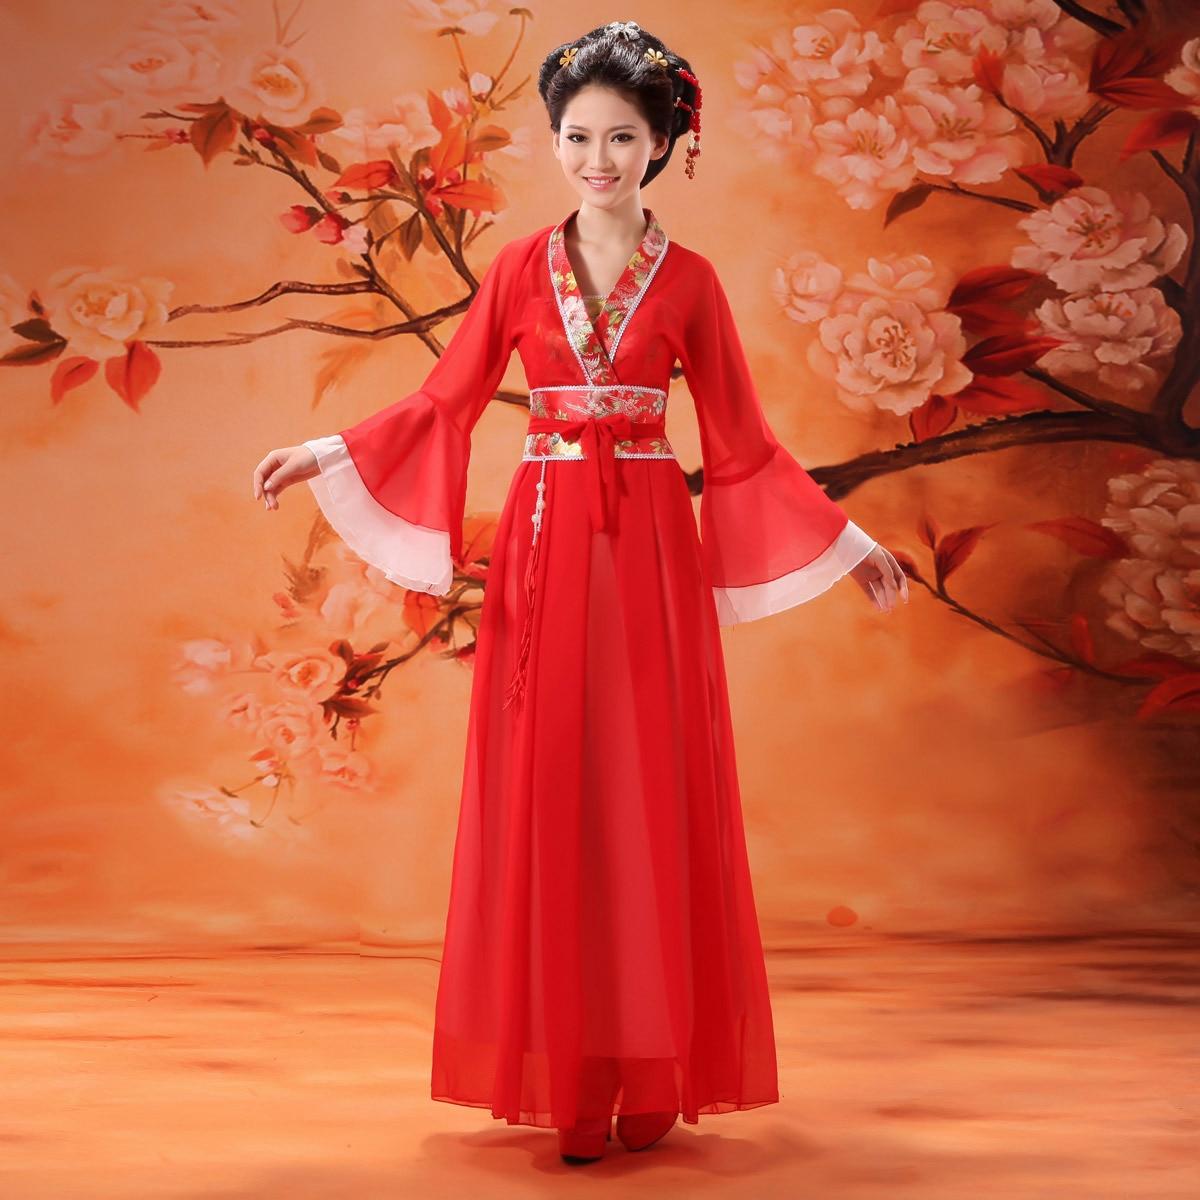 Dance Costume Clothes Fairies Female Tang Suit Hanfu